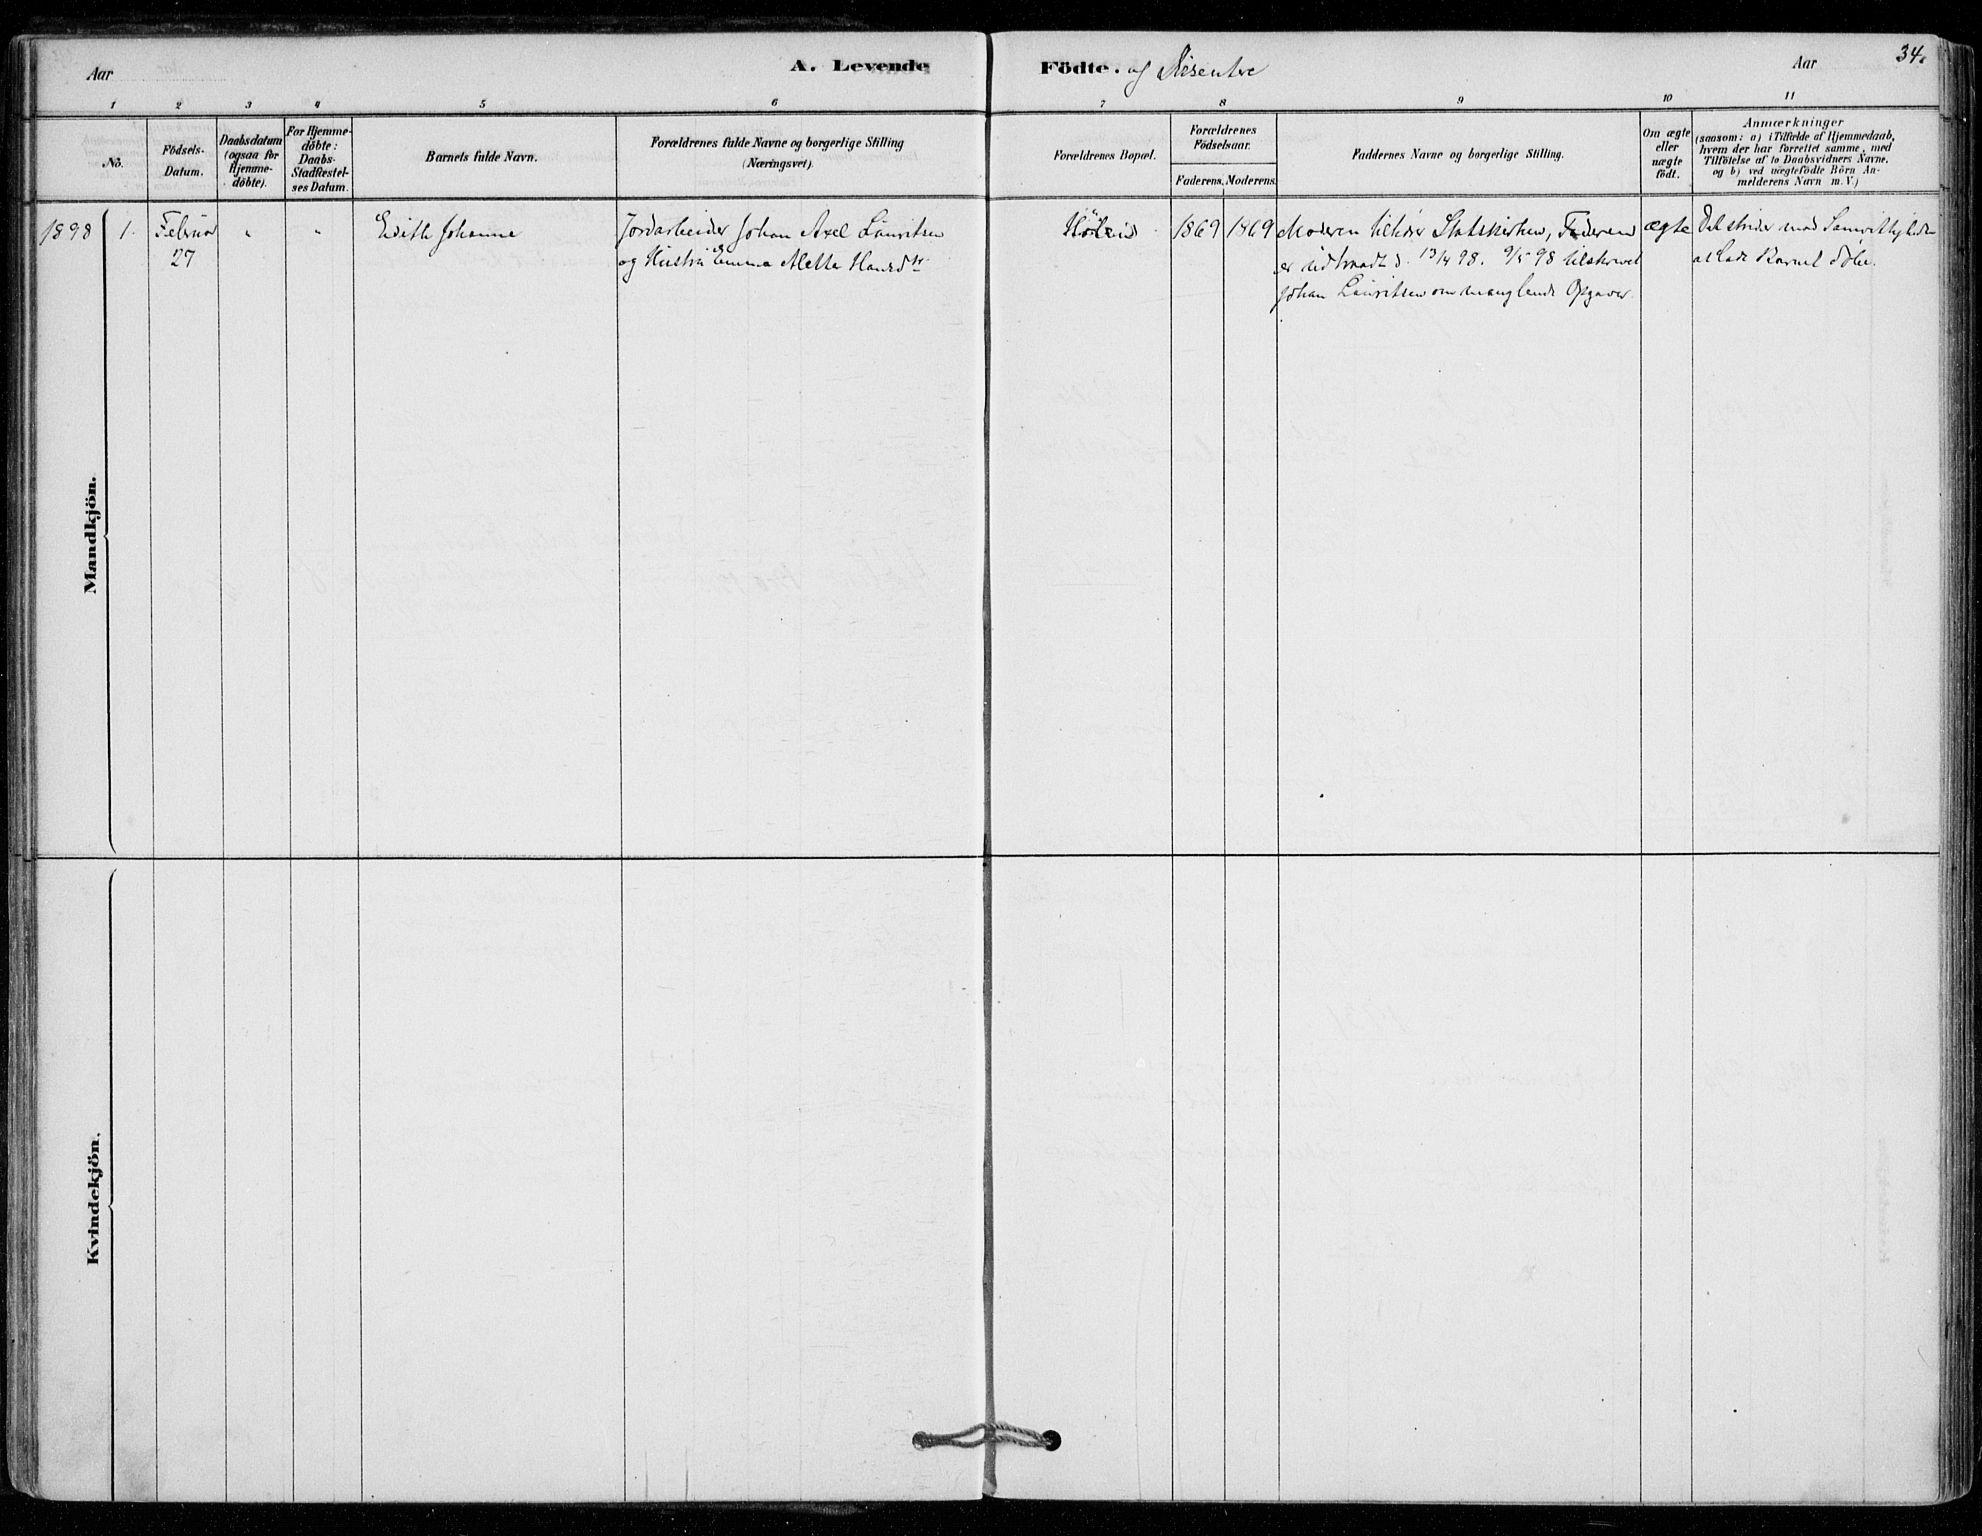 SAO, Vestby prestekontor Kirkebøker, F/Fe/L0001: Parish register (official) no. V 1, 1878-1931, p. 34